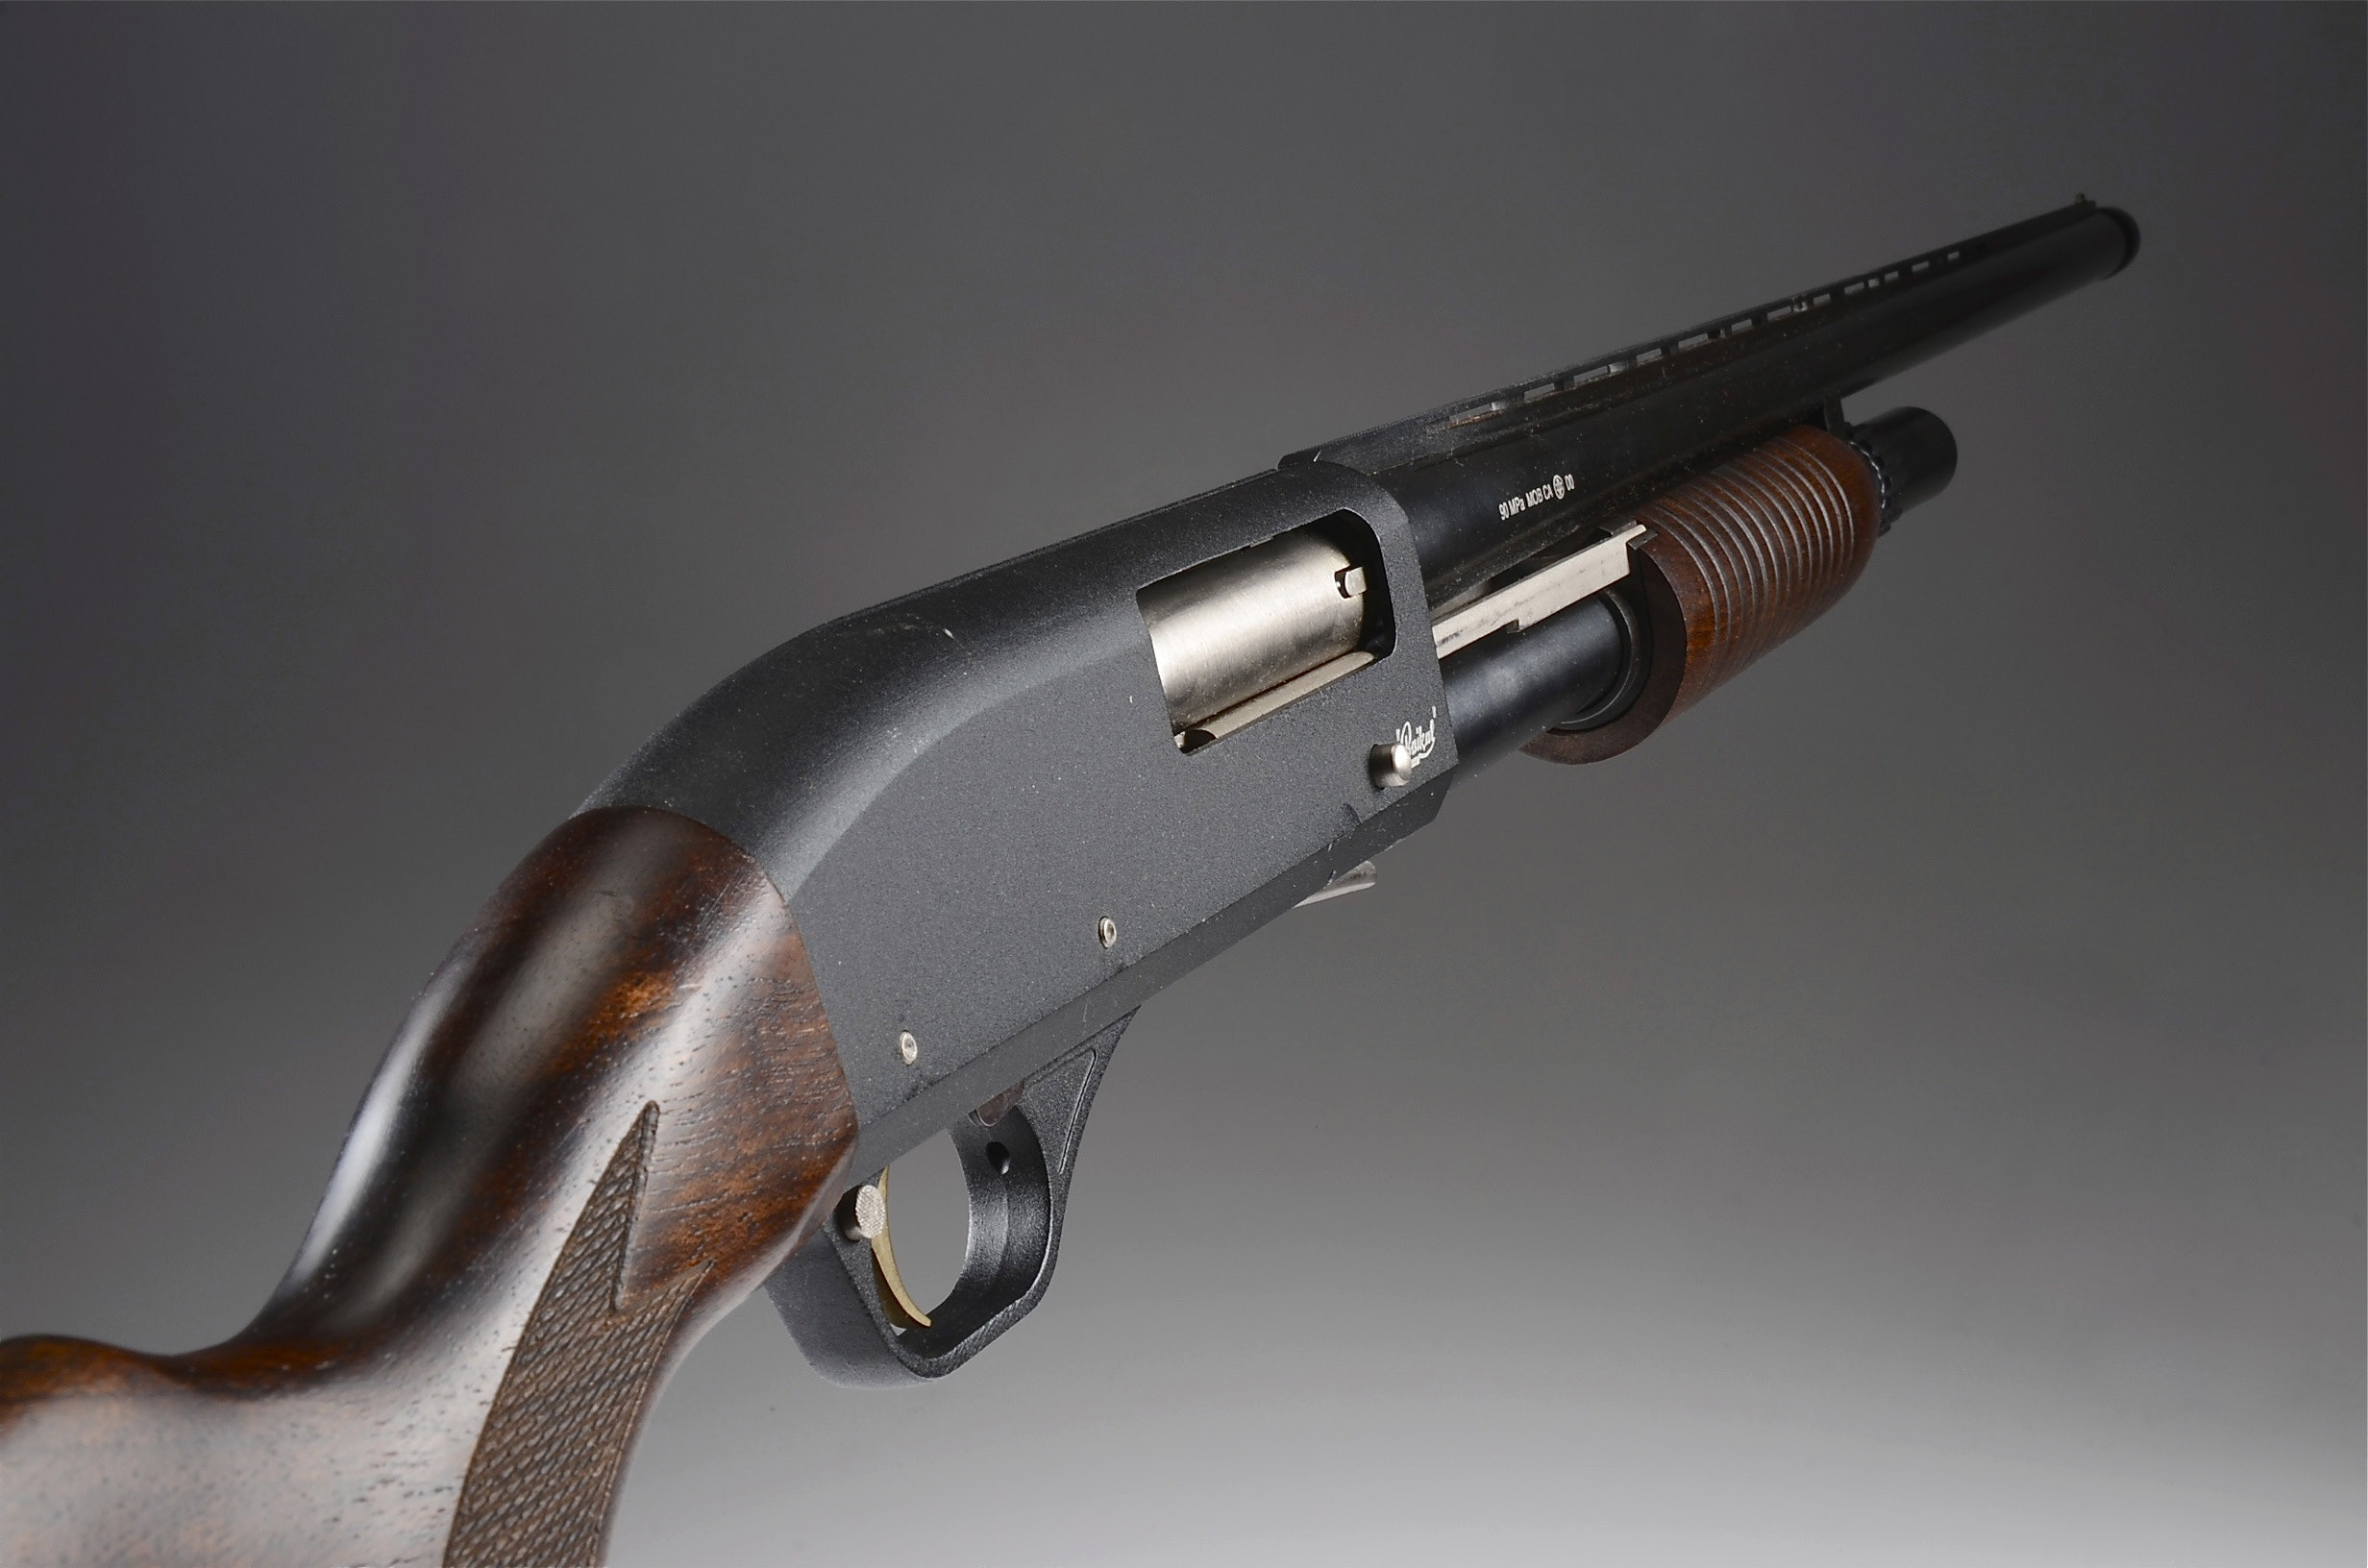 Baikal Model MP-133 12 gauge pump shotgun